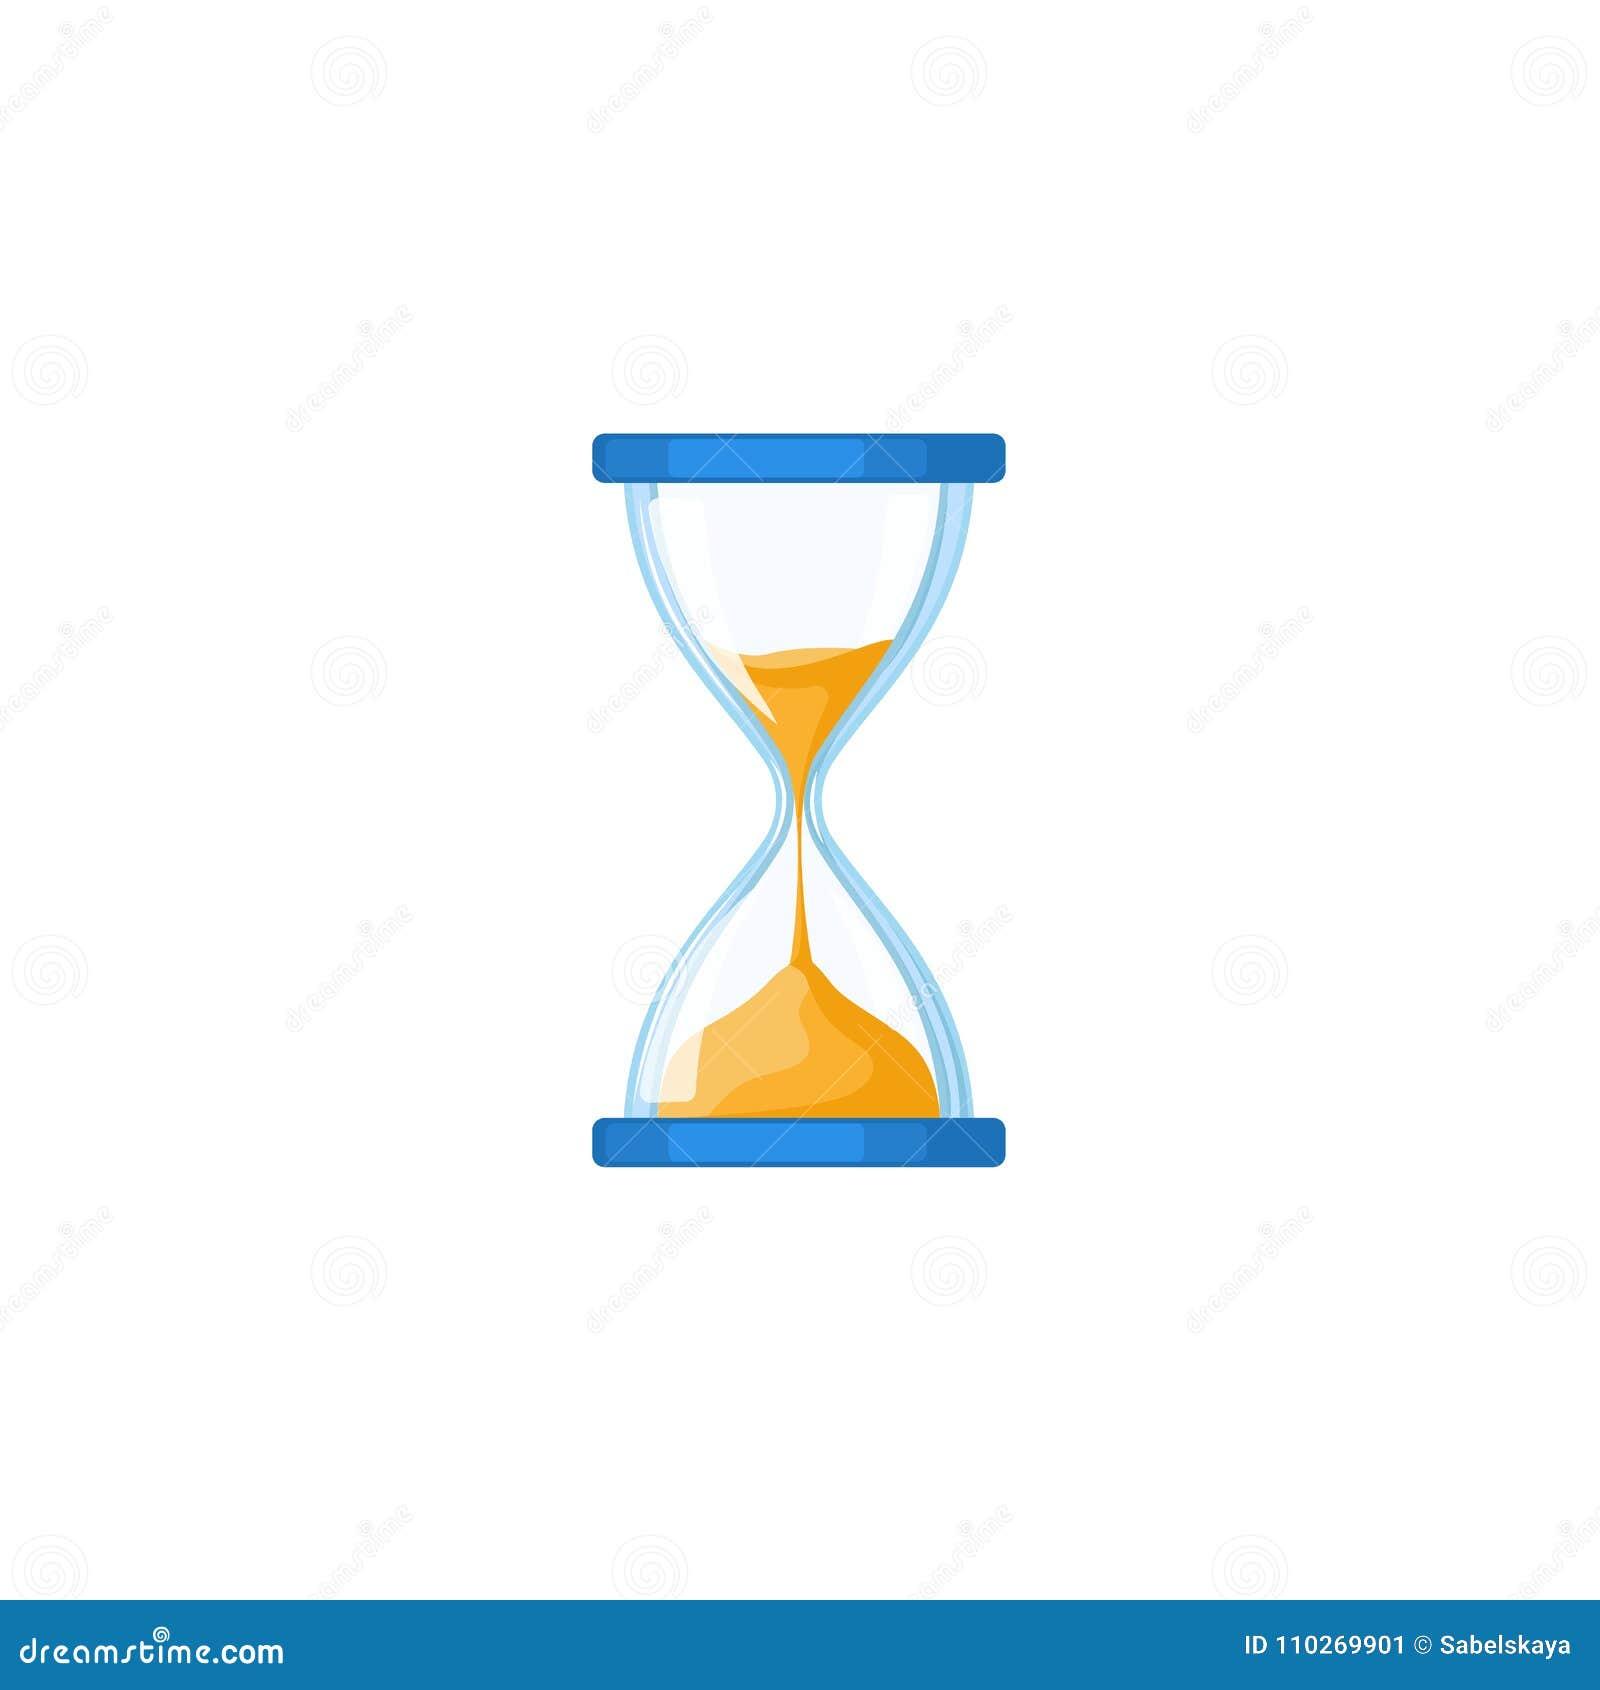 Hourglass, hour-glass, sandglass, sand-glass icon